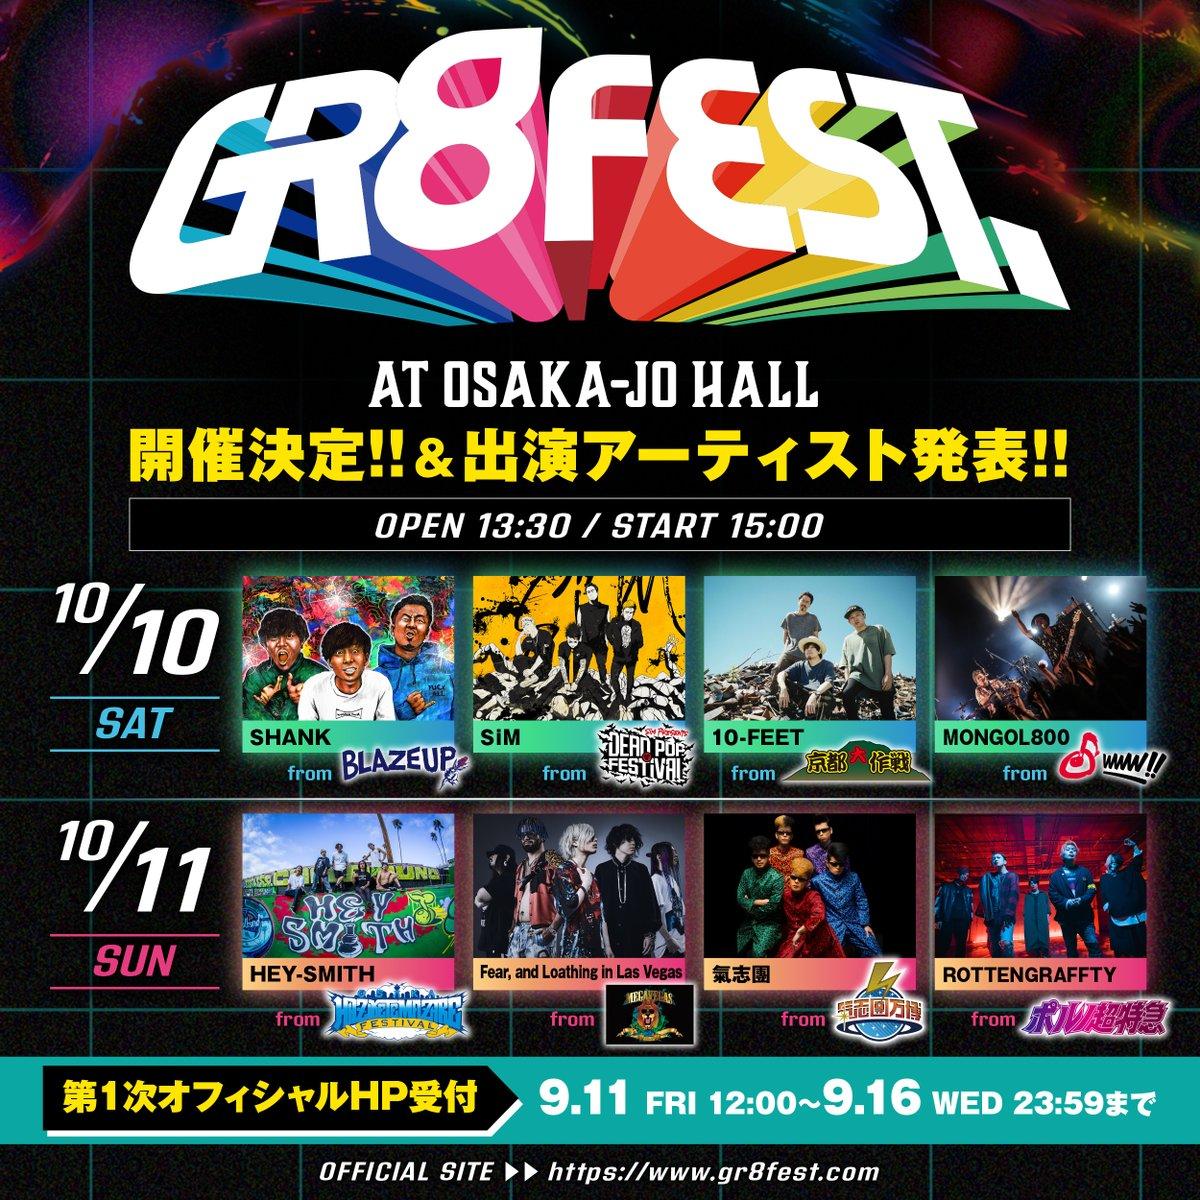 GR8 FEST. AT OSAKA-JO HALL(グレイトエイト フェスト アット オオサカジョウ ホール)開催! それぞれフェスを主催するアーティスト達が大阪に集結! https://t.co/q9mi0Fg7pt  #GR8FEST #BLAZEUPNAGASAKI #DEADPOPFESTiVAL #京都大作戦 #ハジマザ #MEGAVEGAS #氣志團万博 #モンパチフェス #ポル超 https://t.co/ewAtG6WMXr